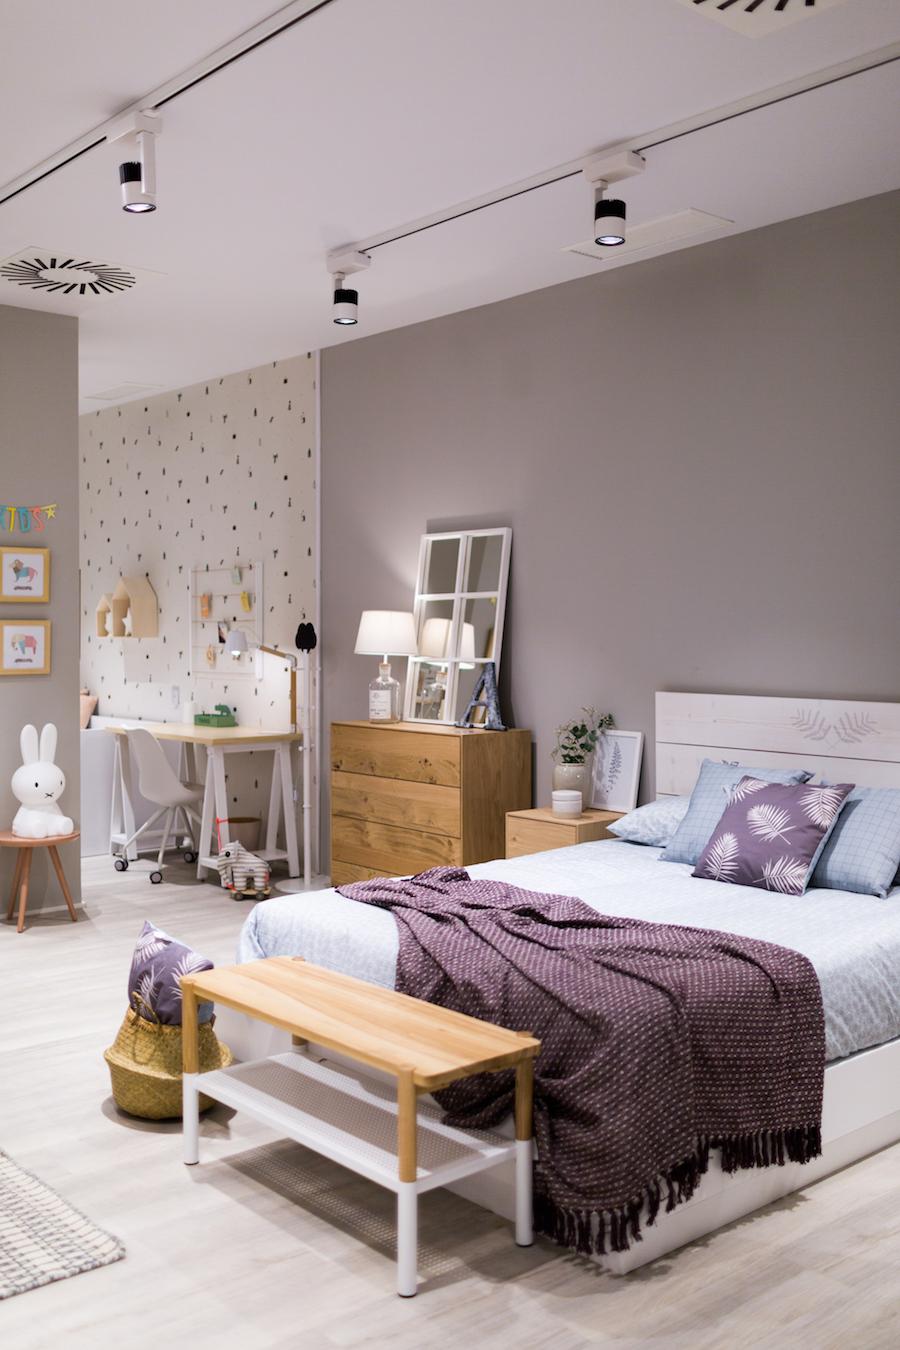 kenayhome kenay home. Black Bedroom Furniture Sets. Home Design Ideas